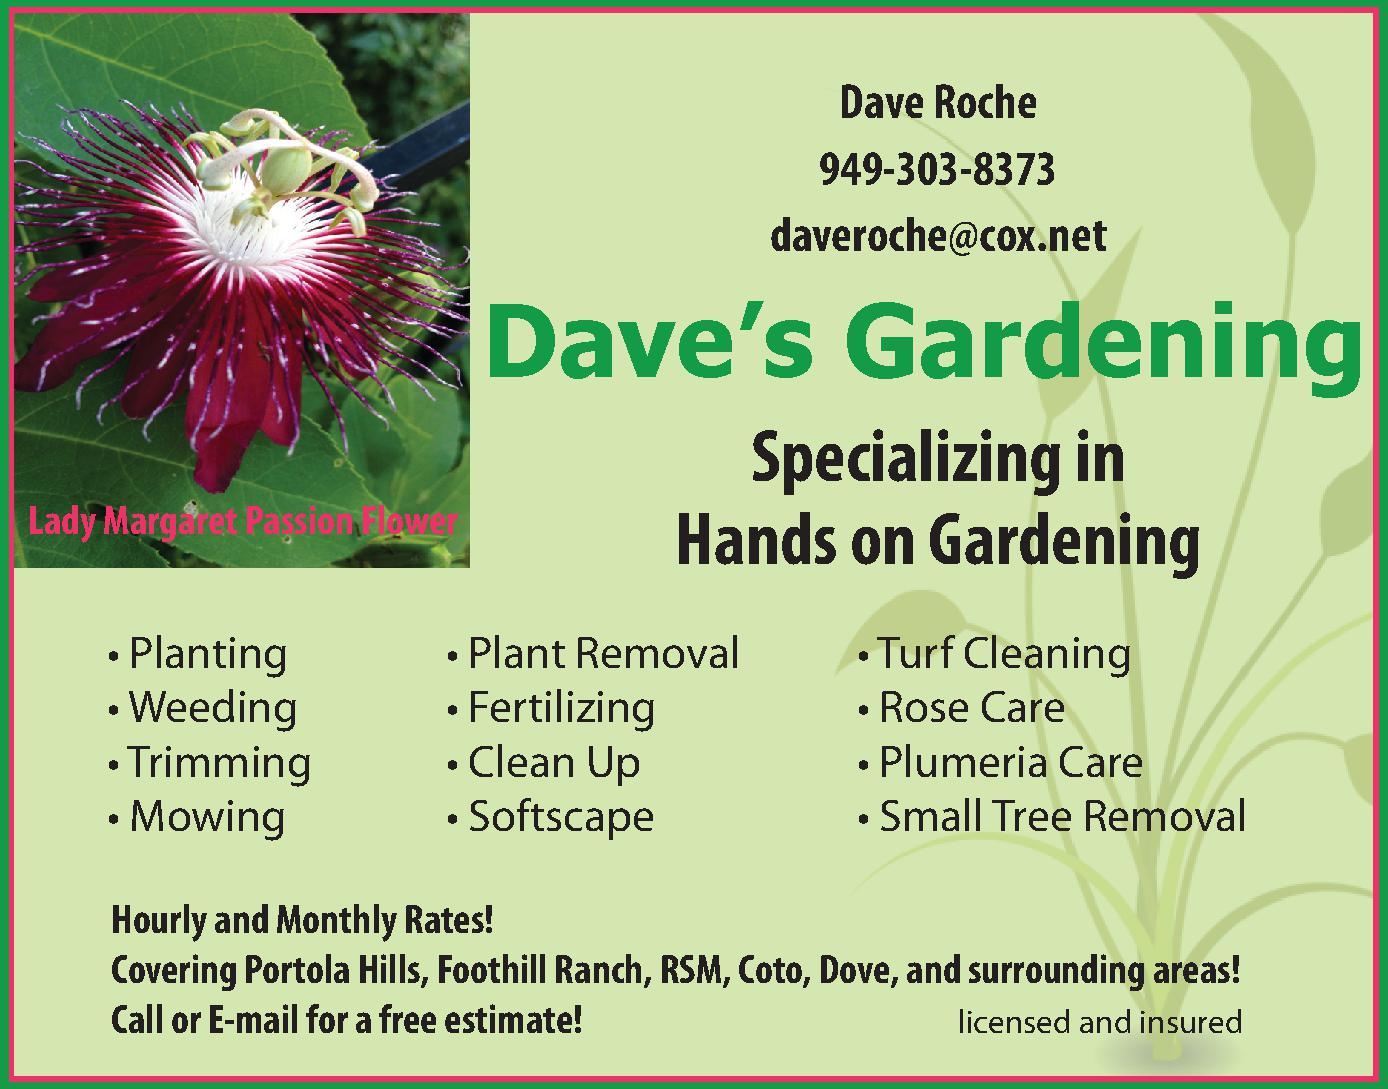 Dave's Gardening